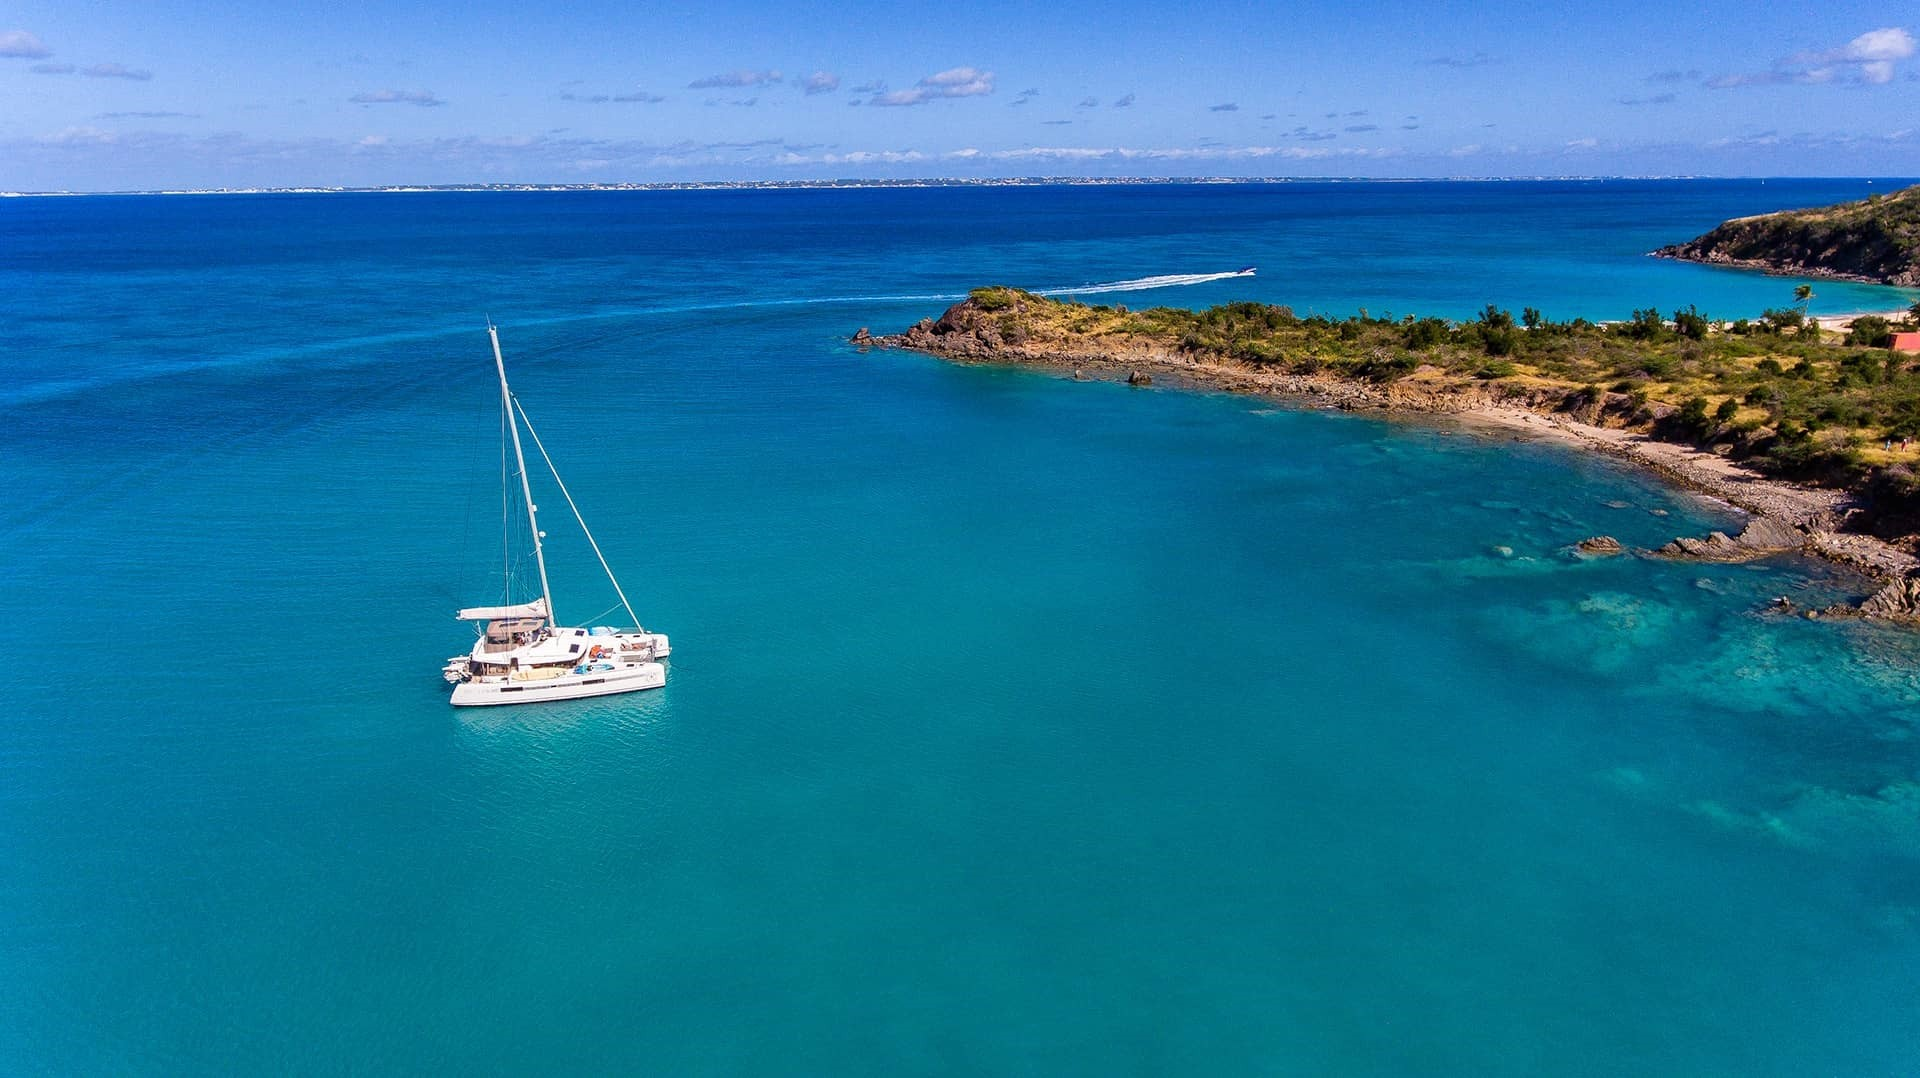 Used Sail Catamaran for Sale 2017 Lagoon 52 F Boat Highlights